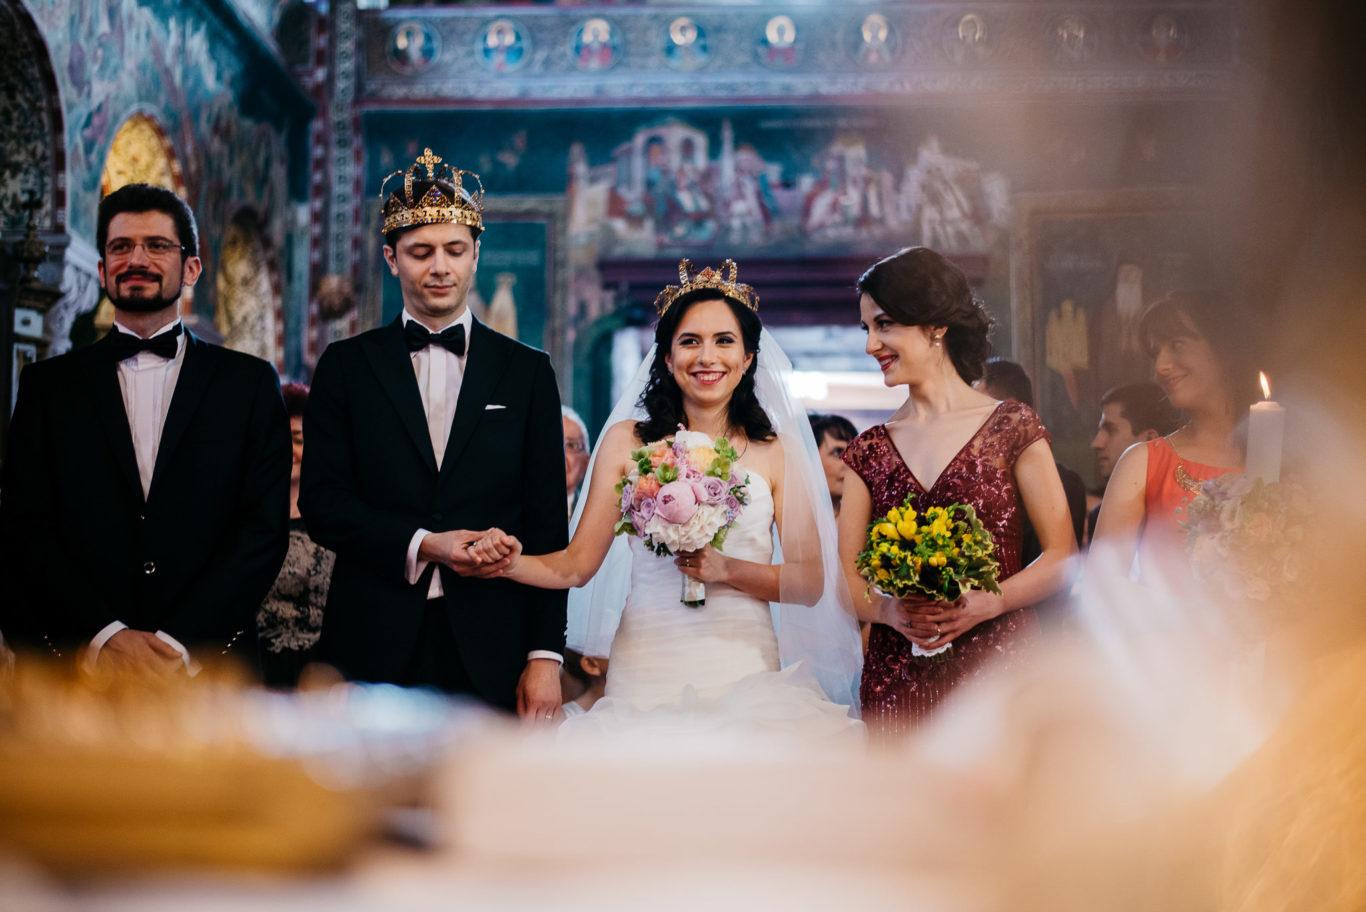 0454-Fotografie-nunta-Simona-Valentin-fotograf-Ciprian-Dumitrescu-DSC_1659